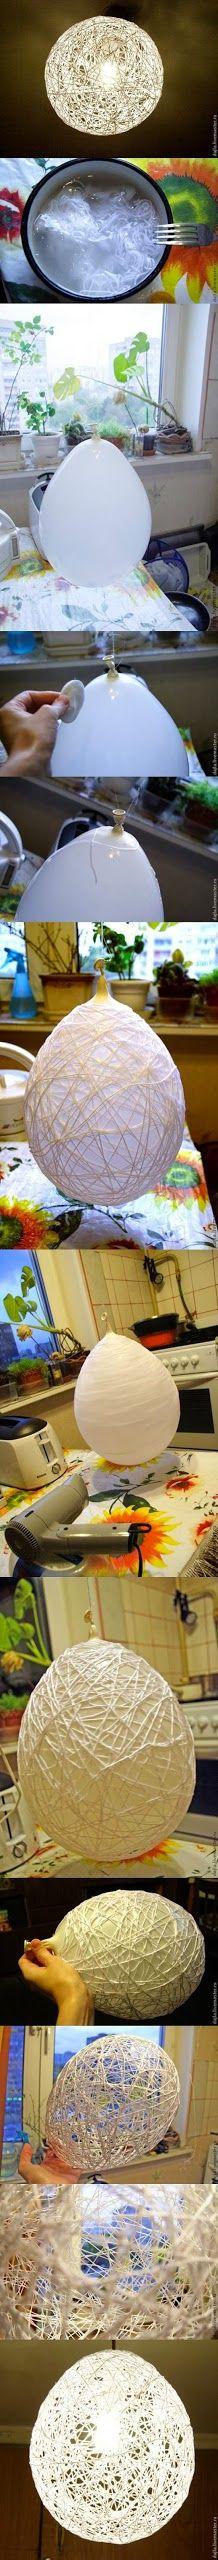 DIY : Yarn Made Chandelier | DIY  Crafts Tutorials